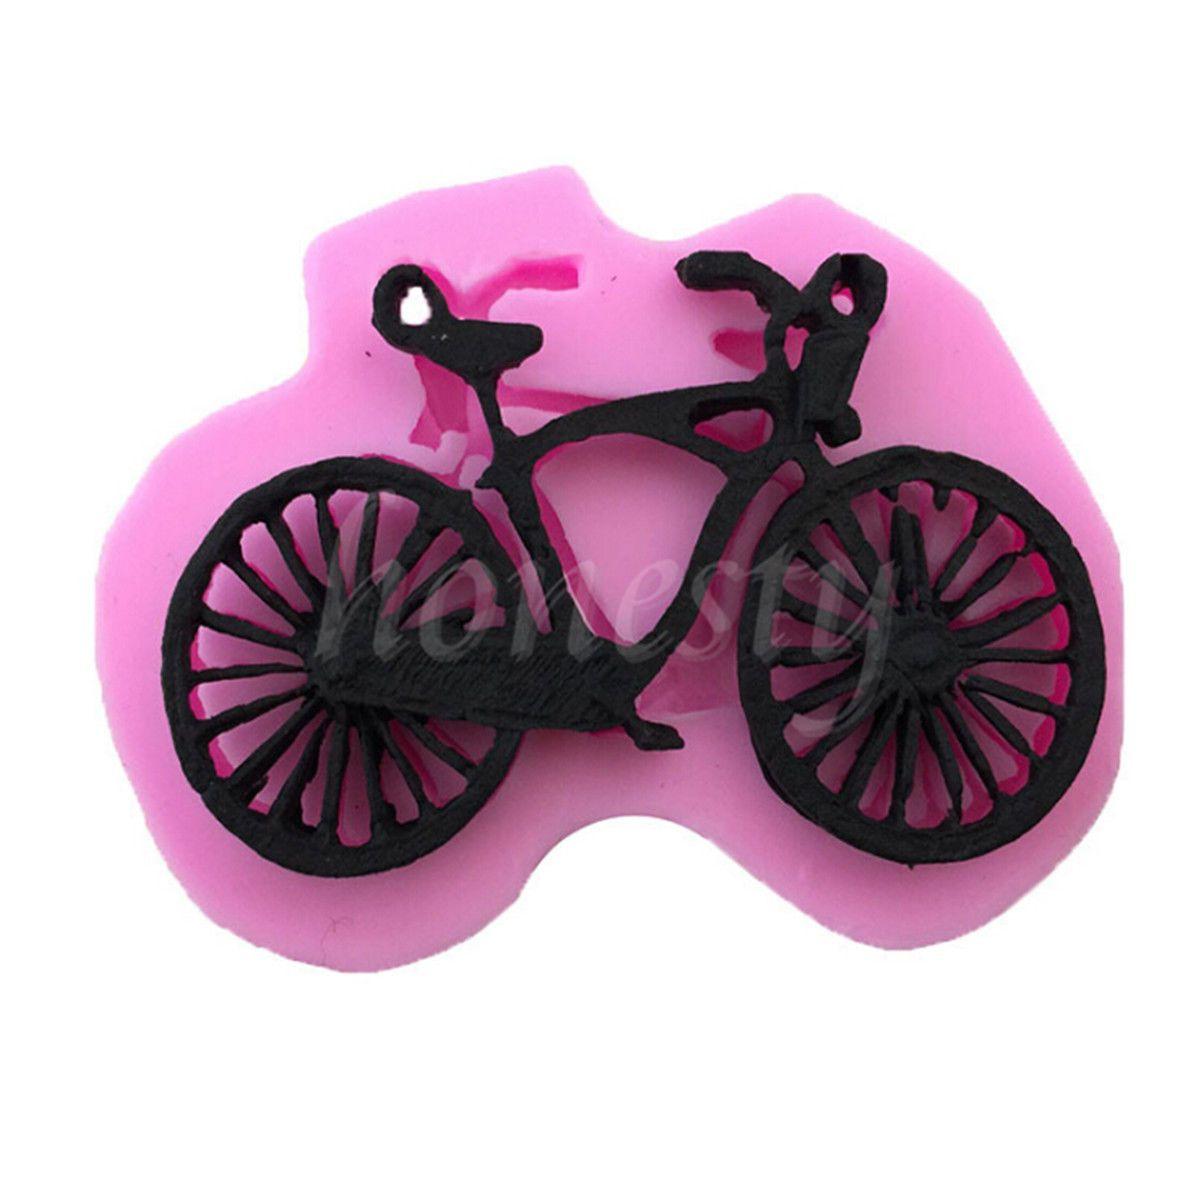 Grosshandel Silikon 3d Fahrrad Fondant Kuchen Schokoladenform Mould